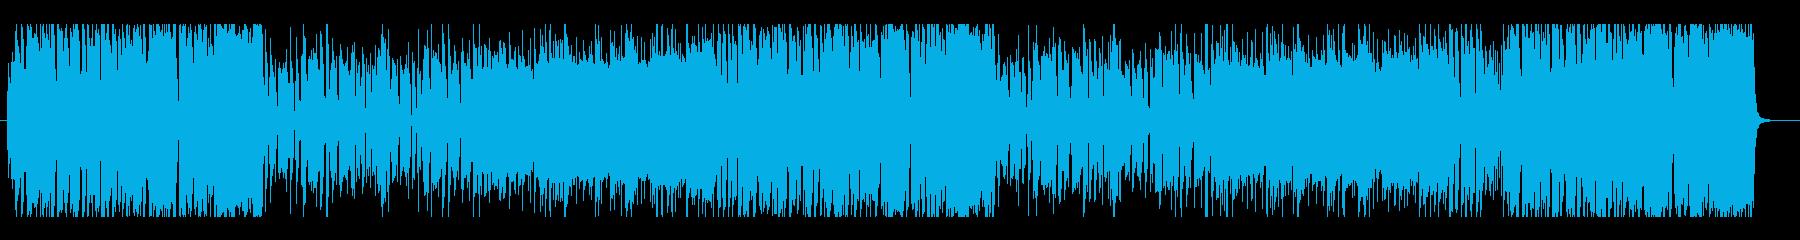 OPに使えそうなストリングスの曲の再生済みの波形